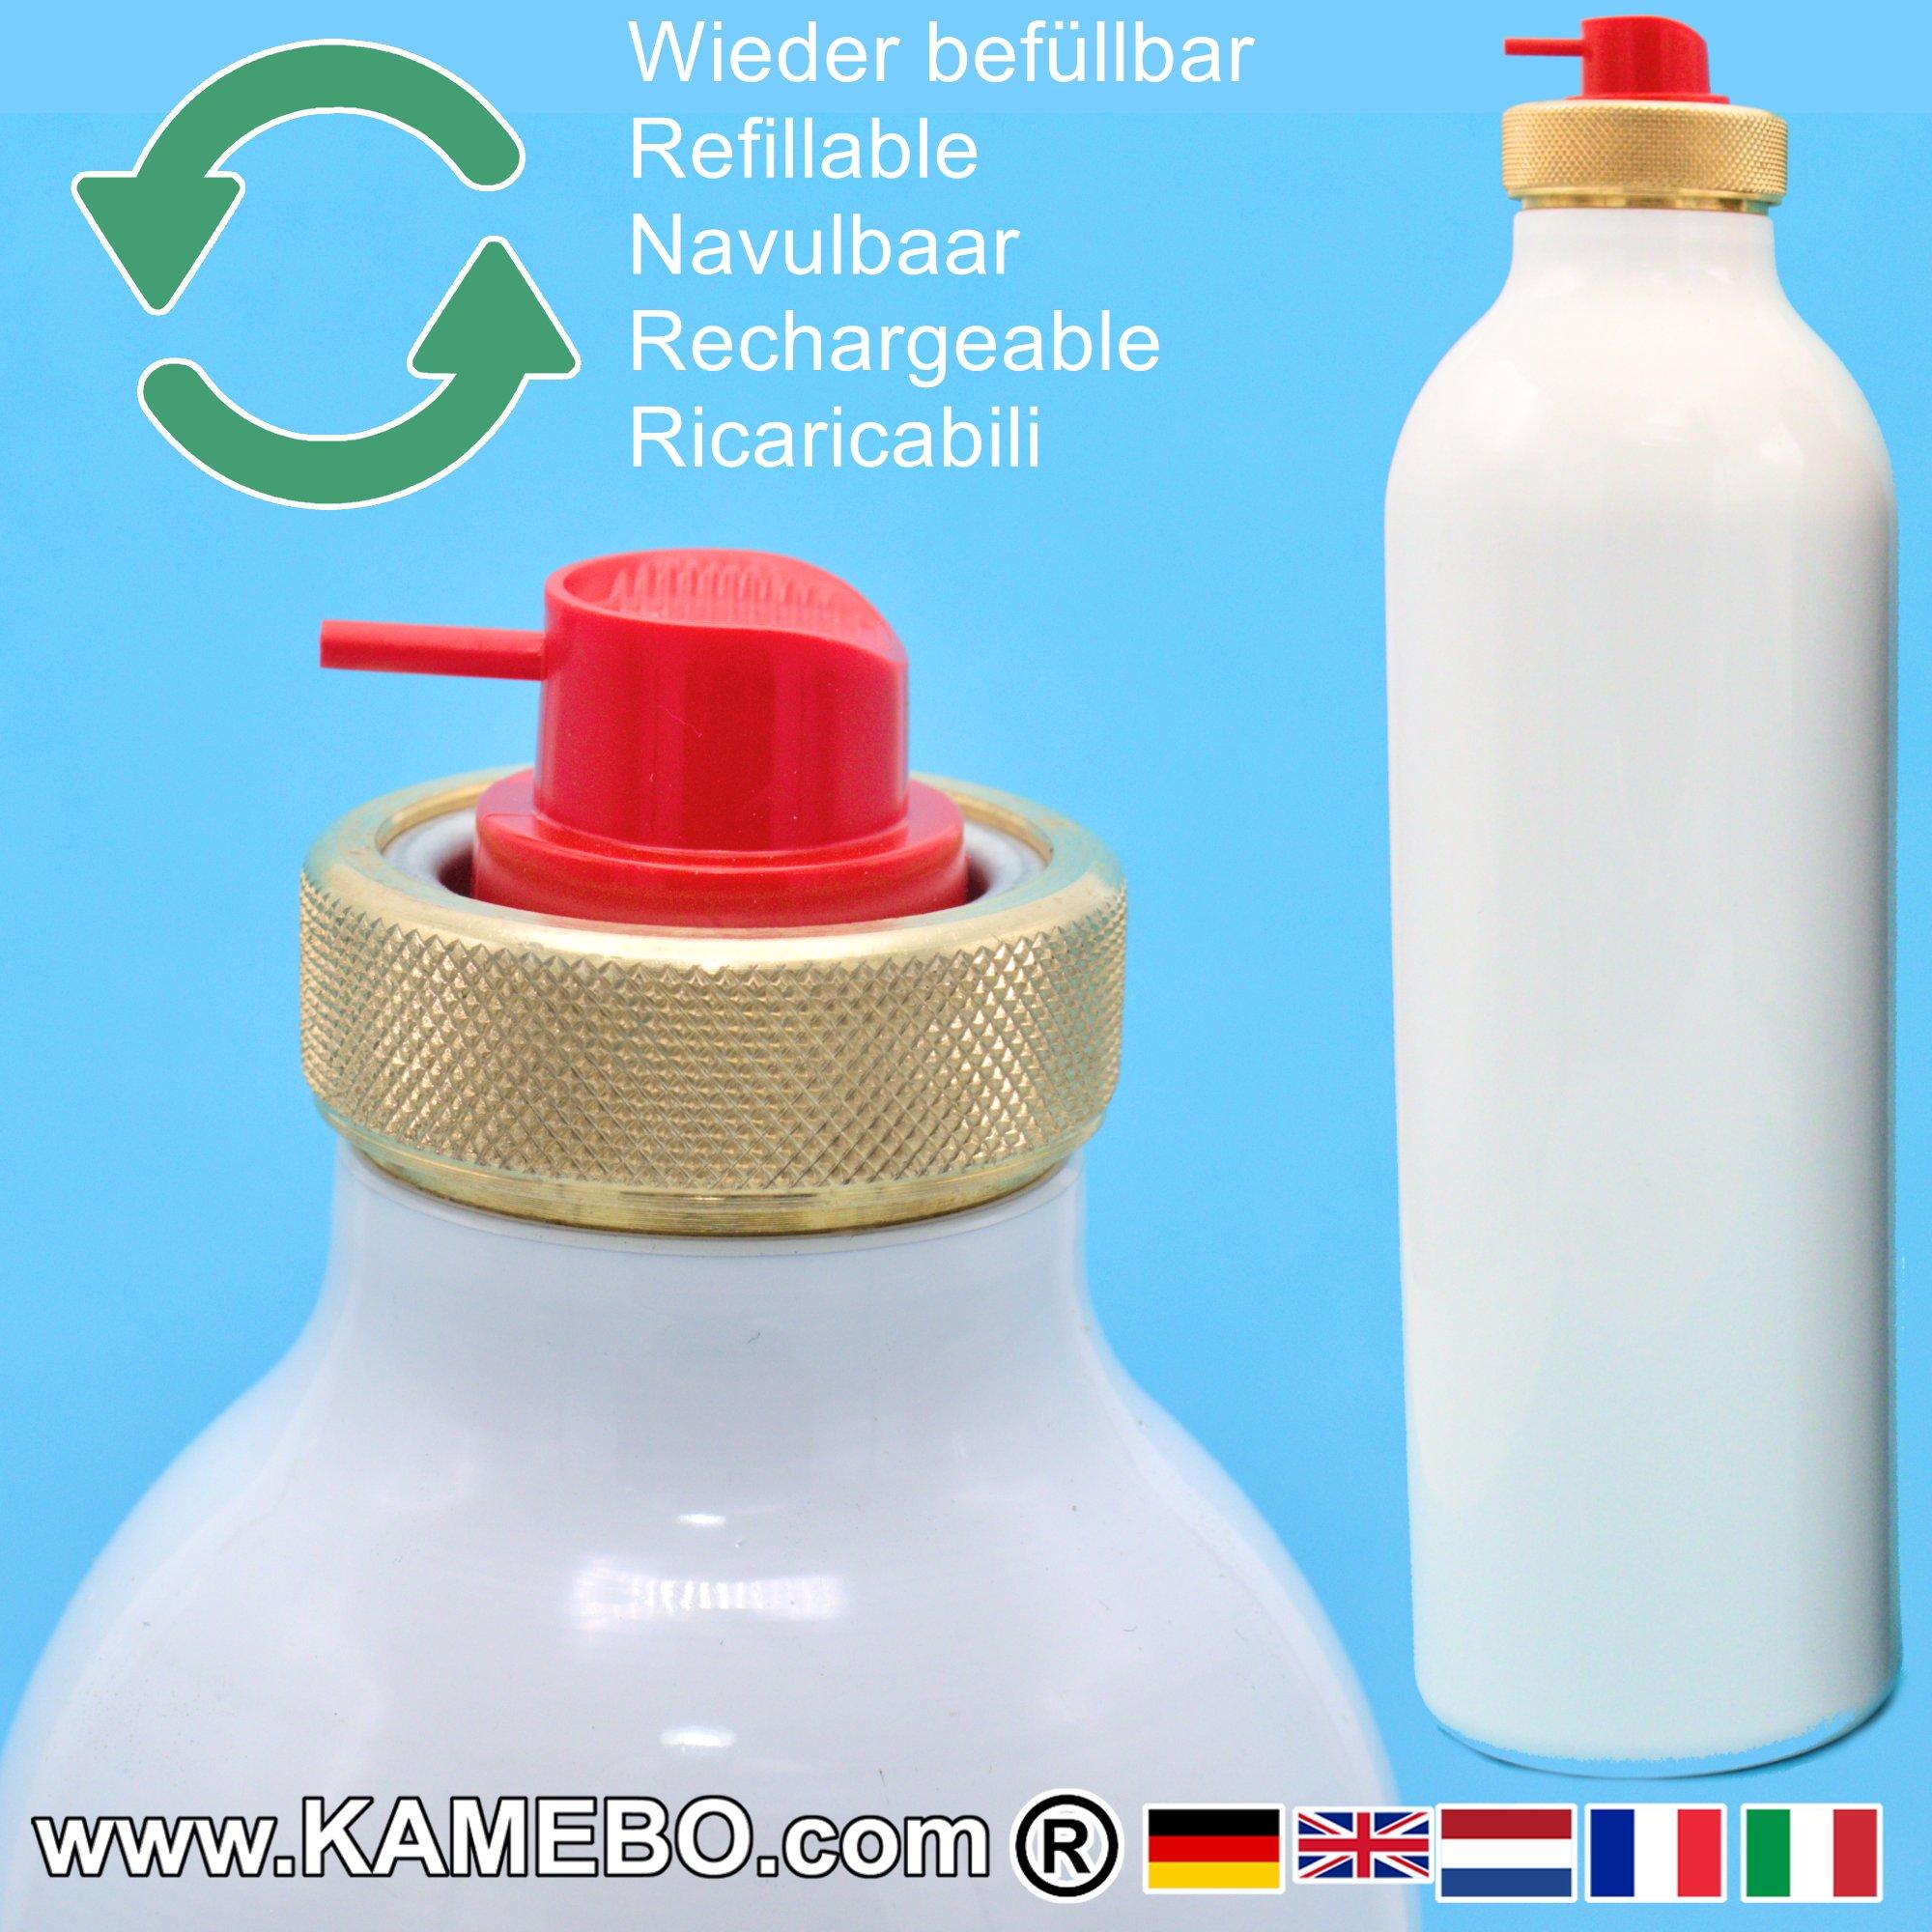 Eco Sprayer Vaupel 4500 Refillable Spray Can